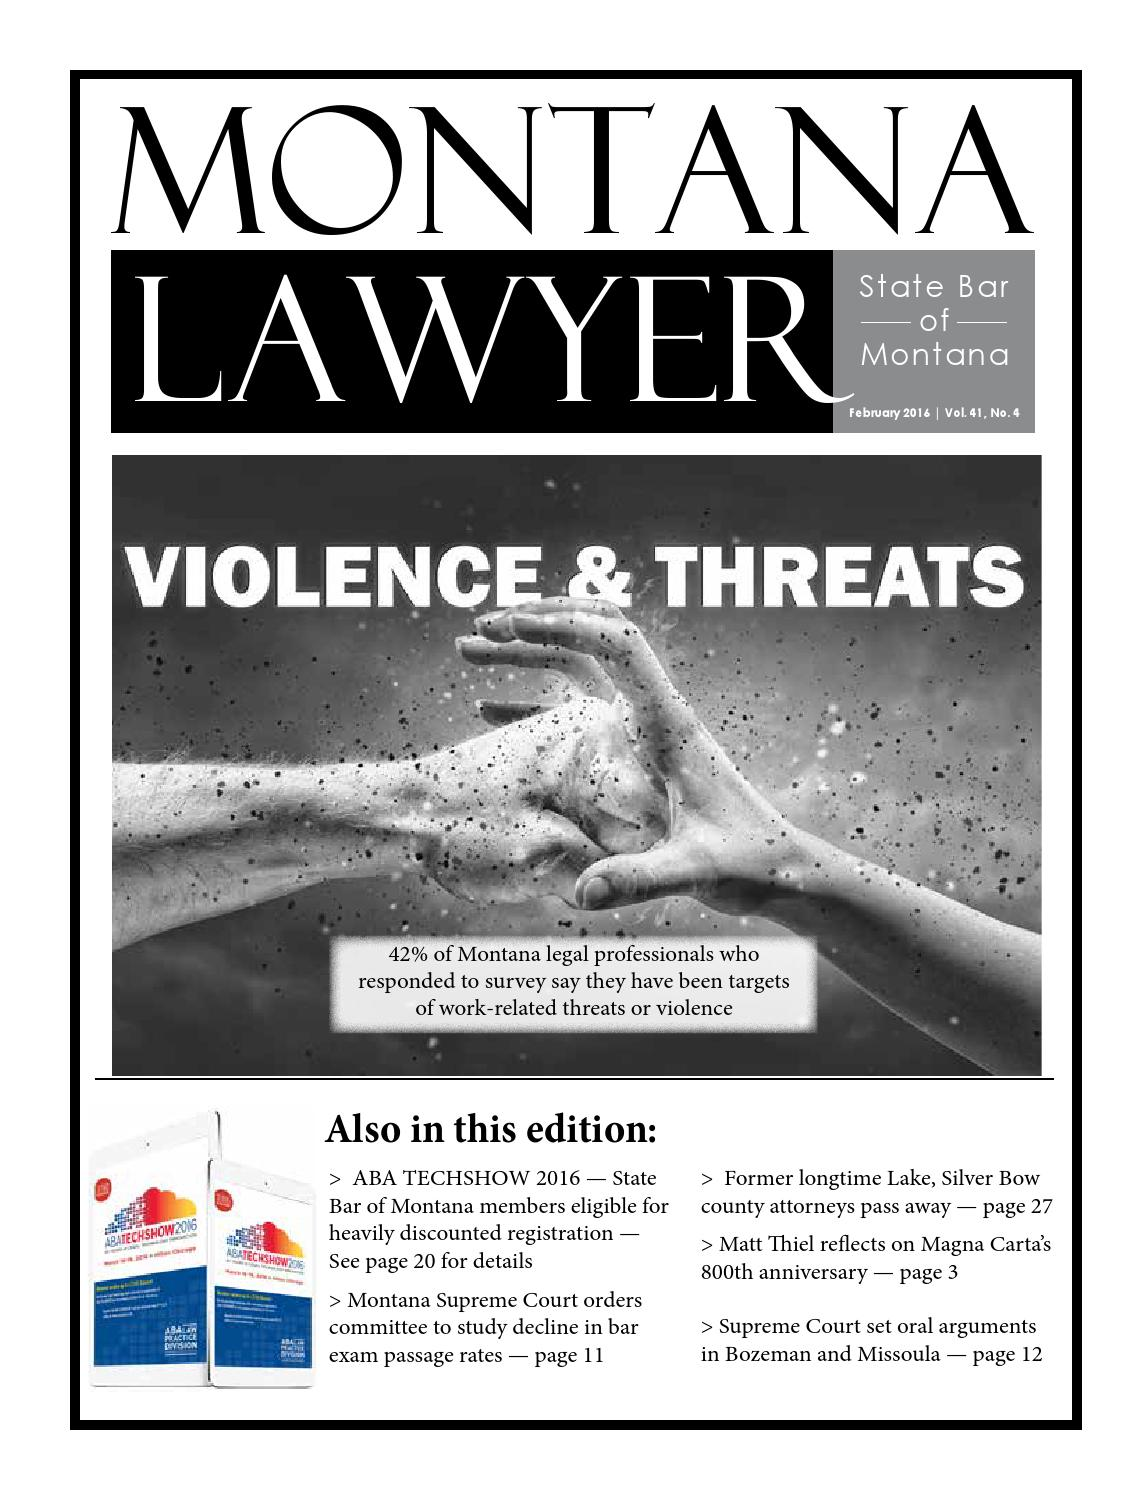 Montana Lawyer February 2016 by State Bar of Montana - issuu